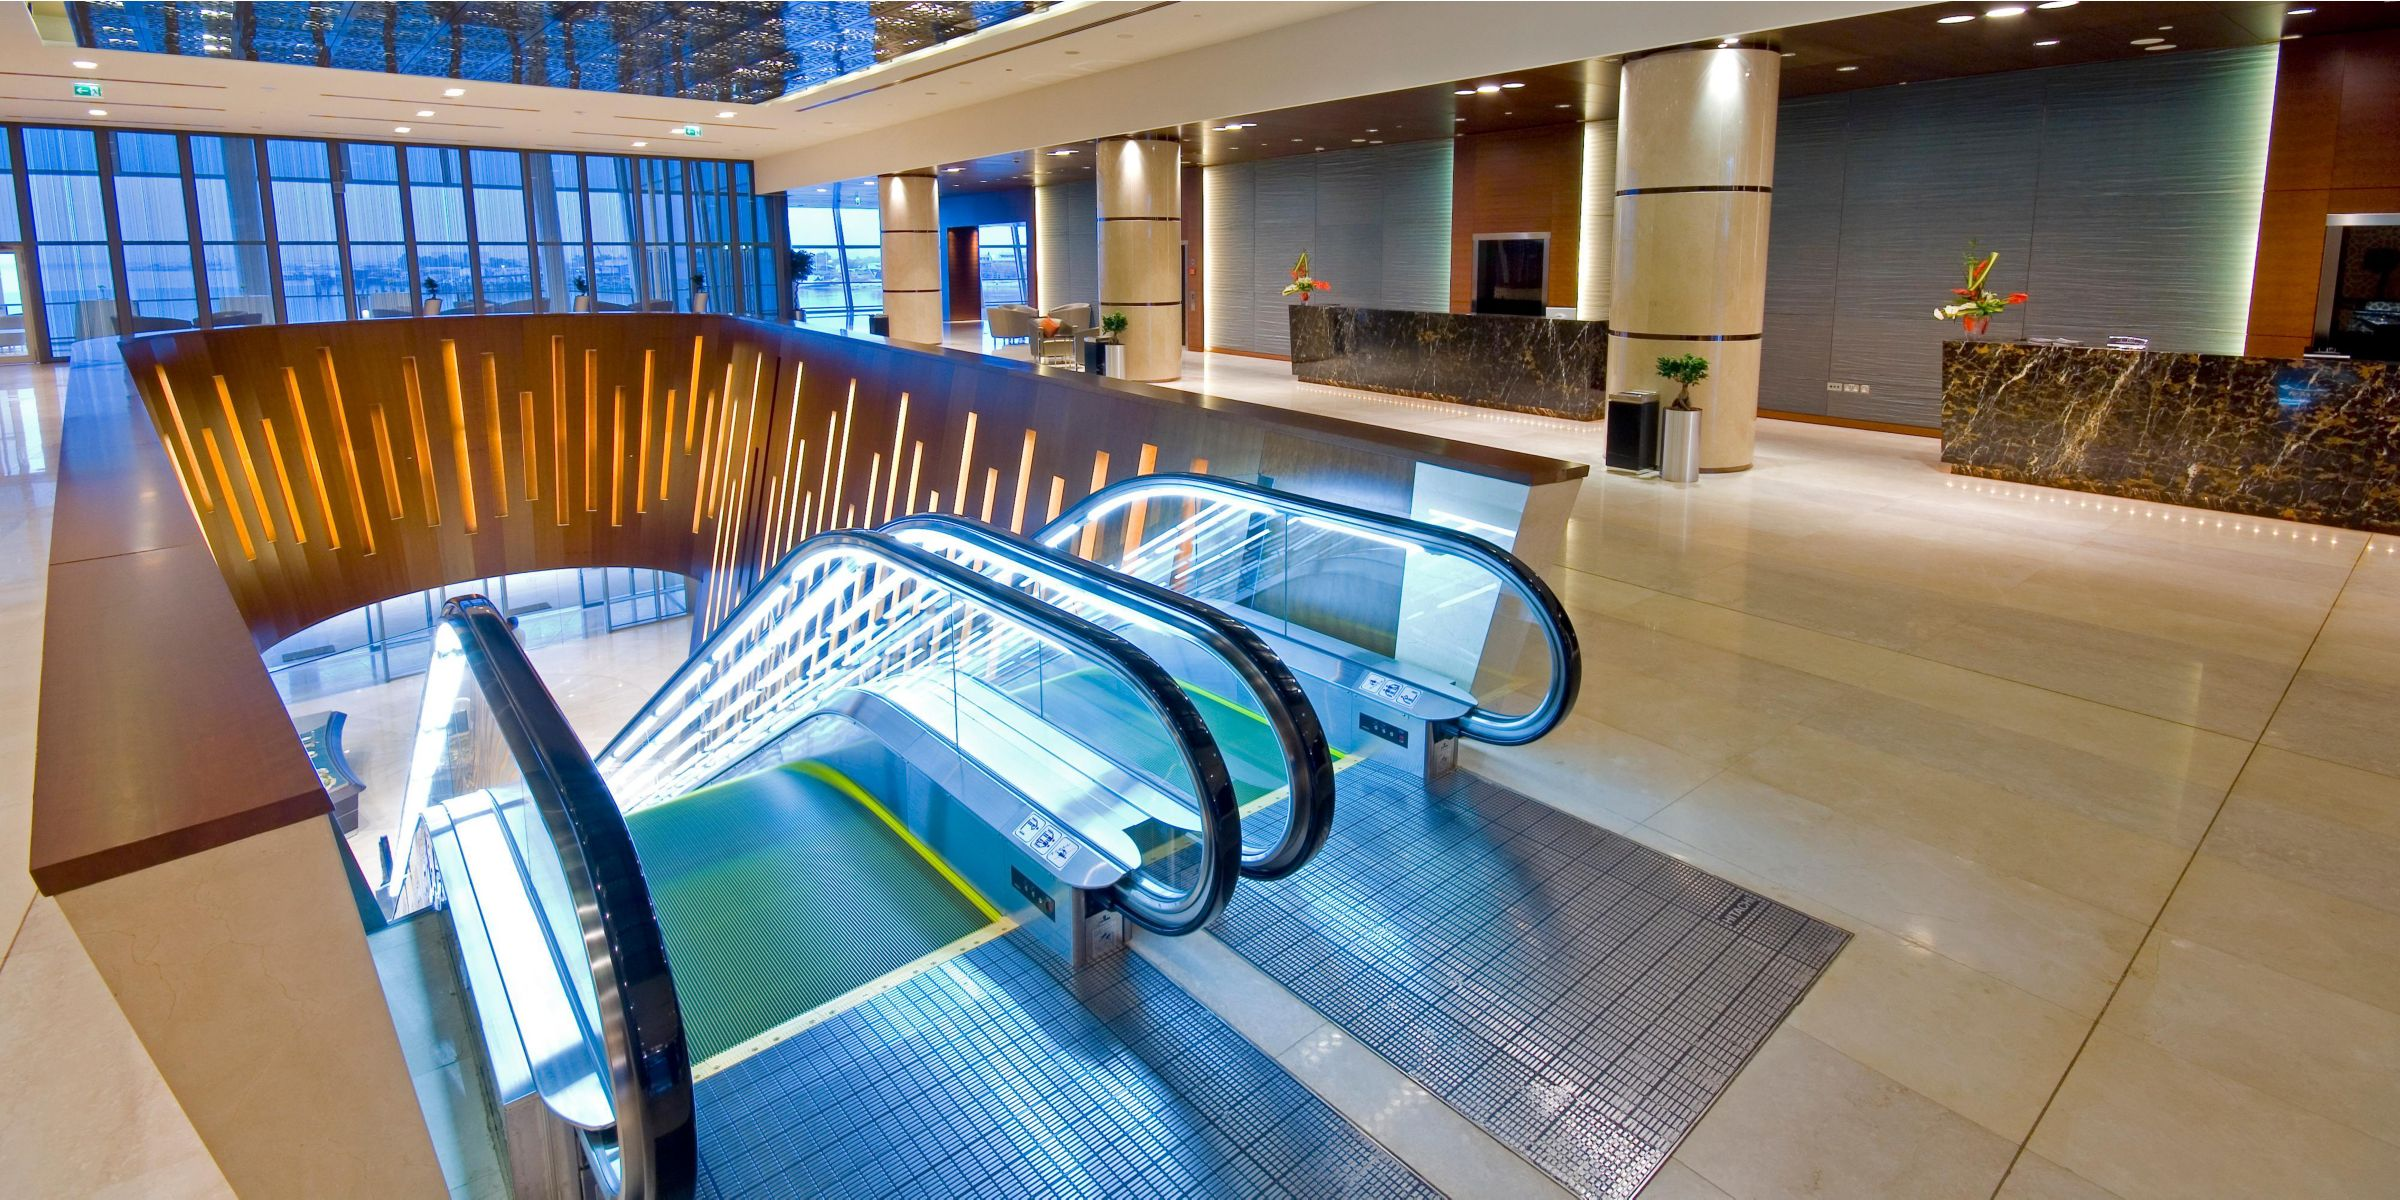 Hotel Lobby Reception Area The Event Centre